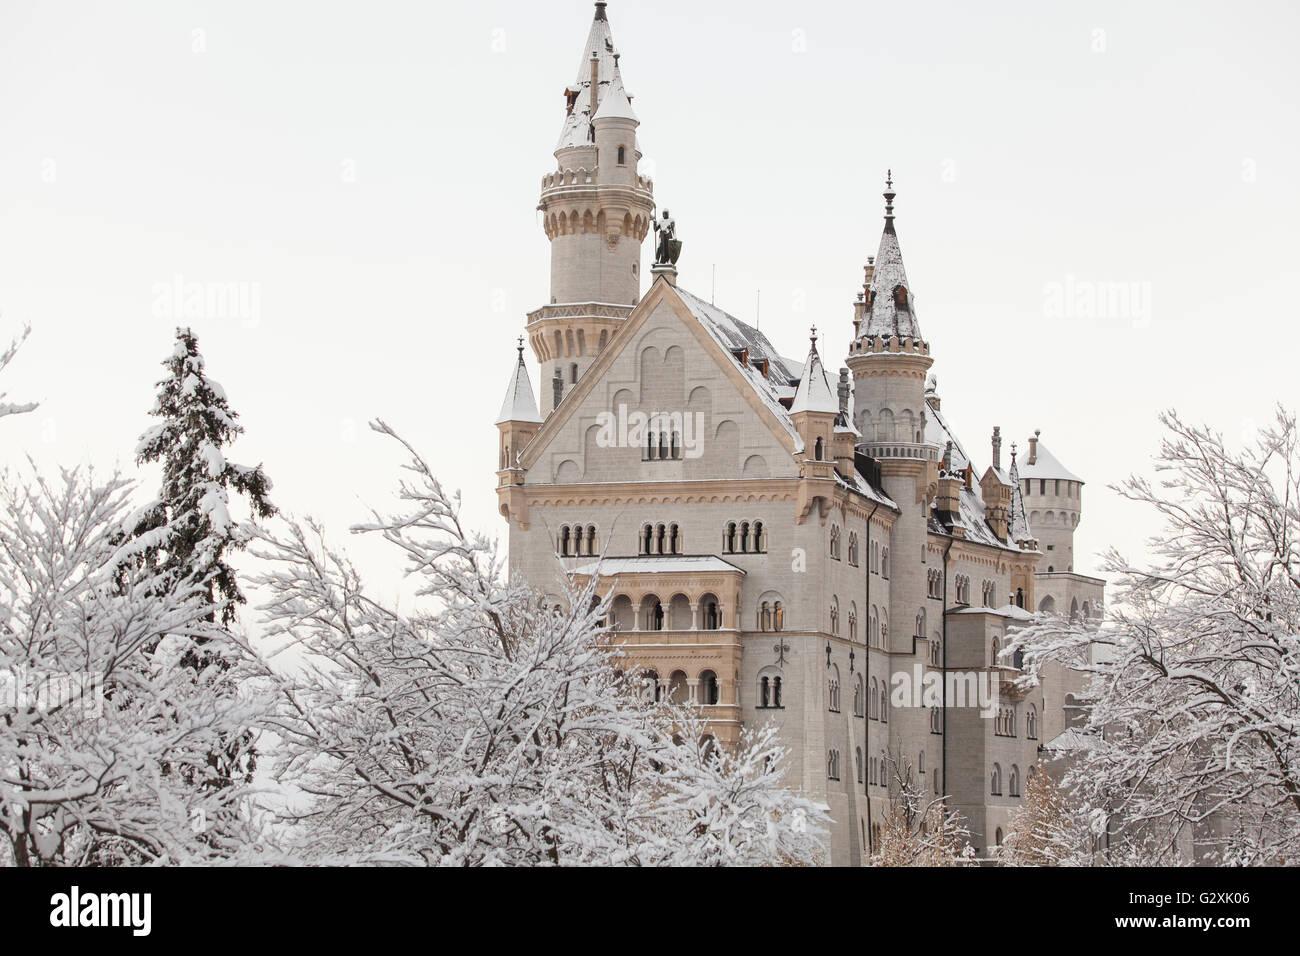 Neuschwanstein Castle in winter landscape - Stock Image